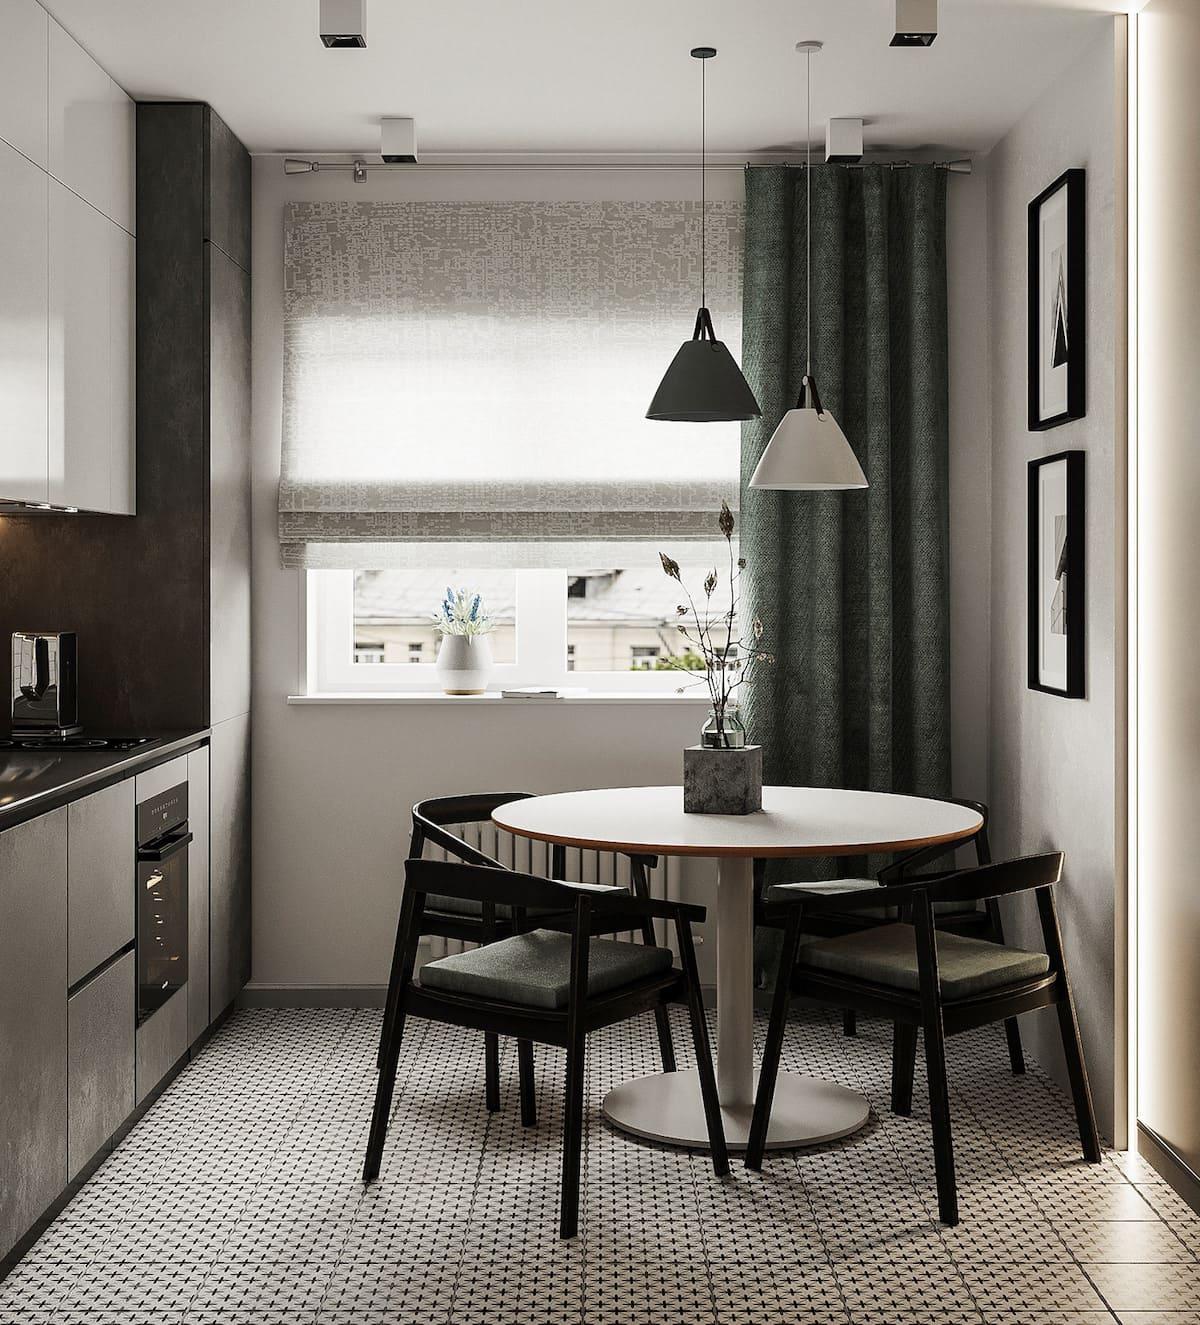 дизайн однокомнатной квартиры фото 57